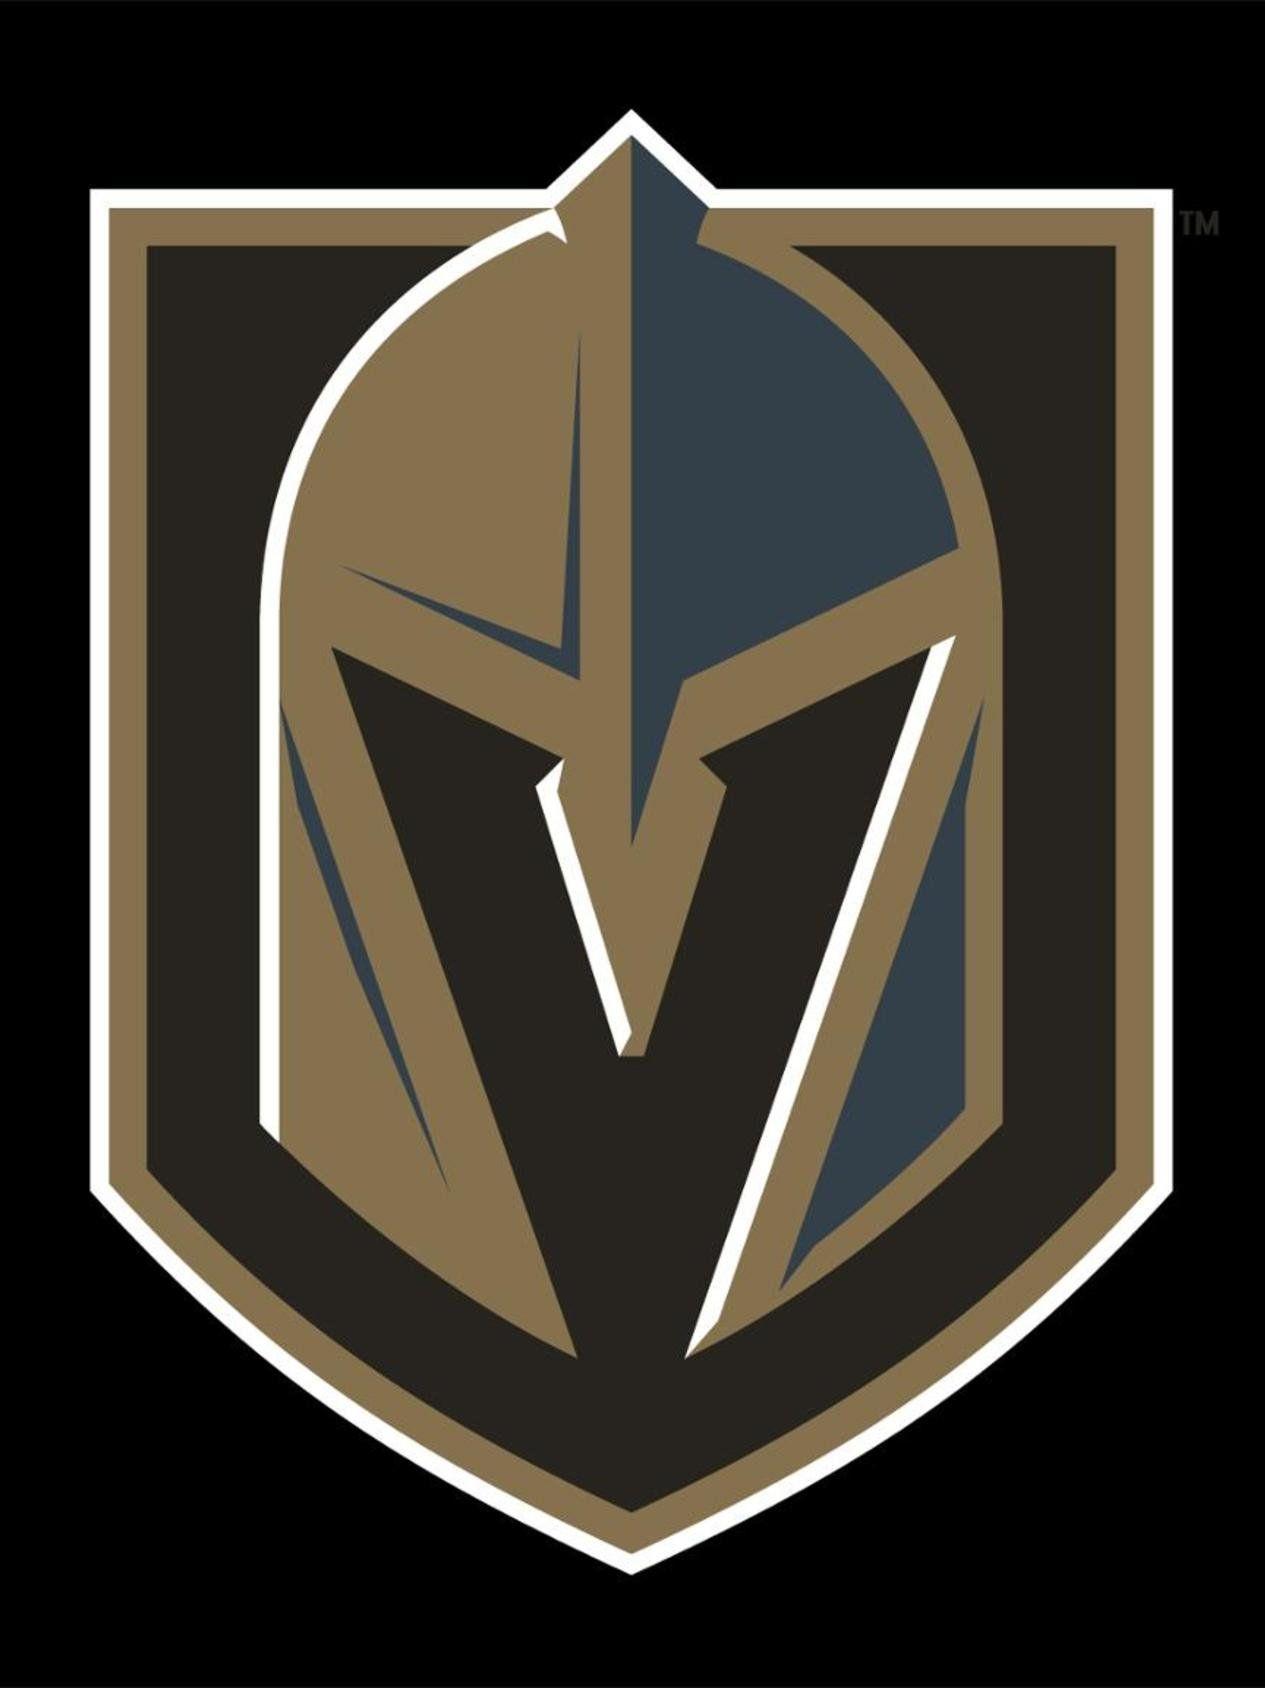 Vegas Golden Knights N H L S New Team Take Their Place On The Strip Golden Knights Logo Vegas Golden Knights Logo Golden Knights Hockey